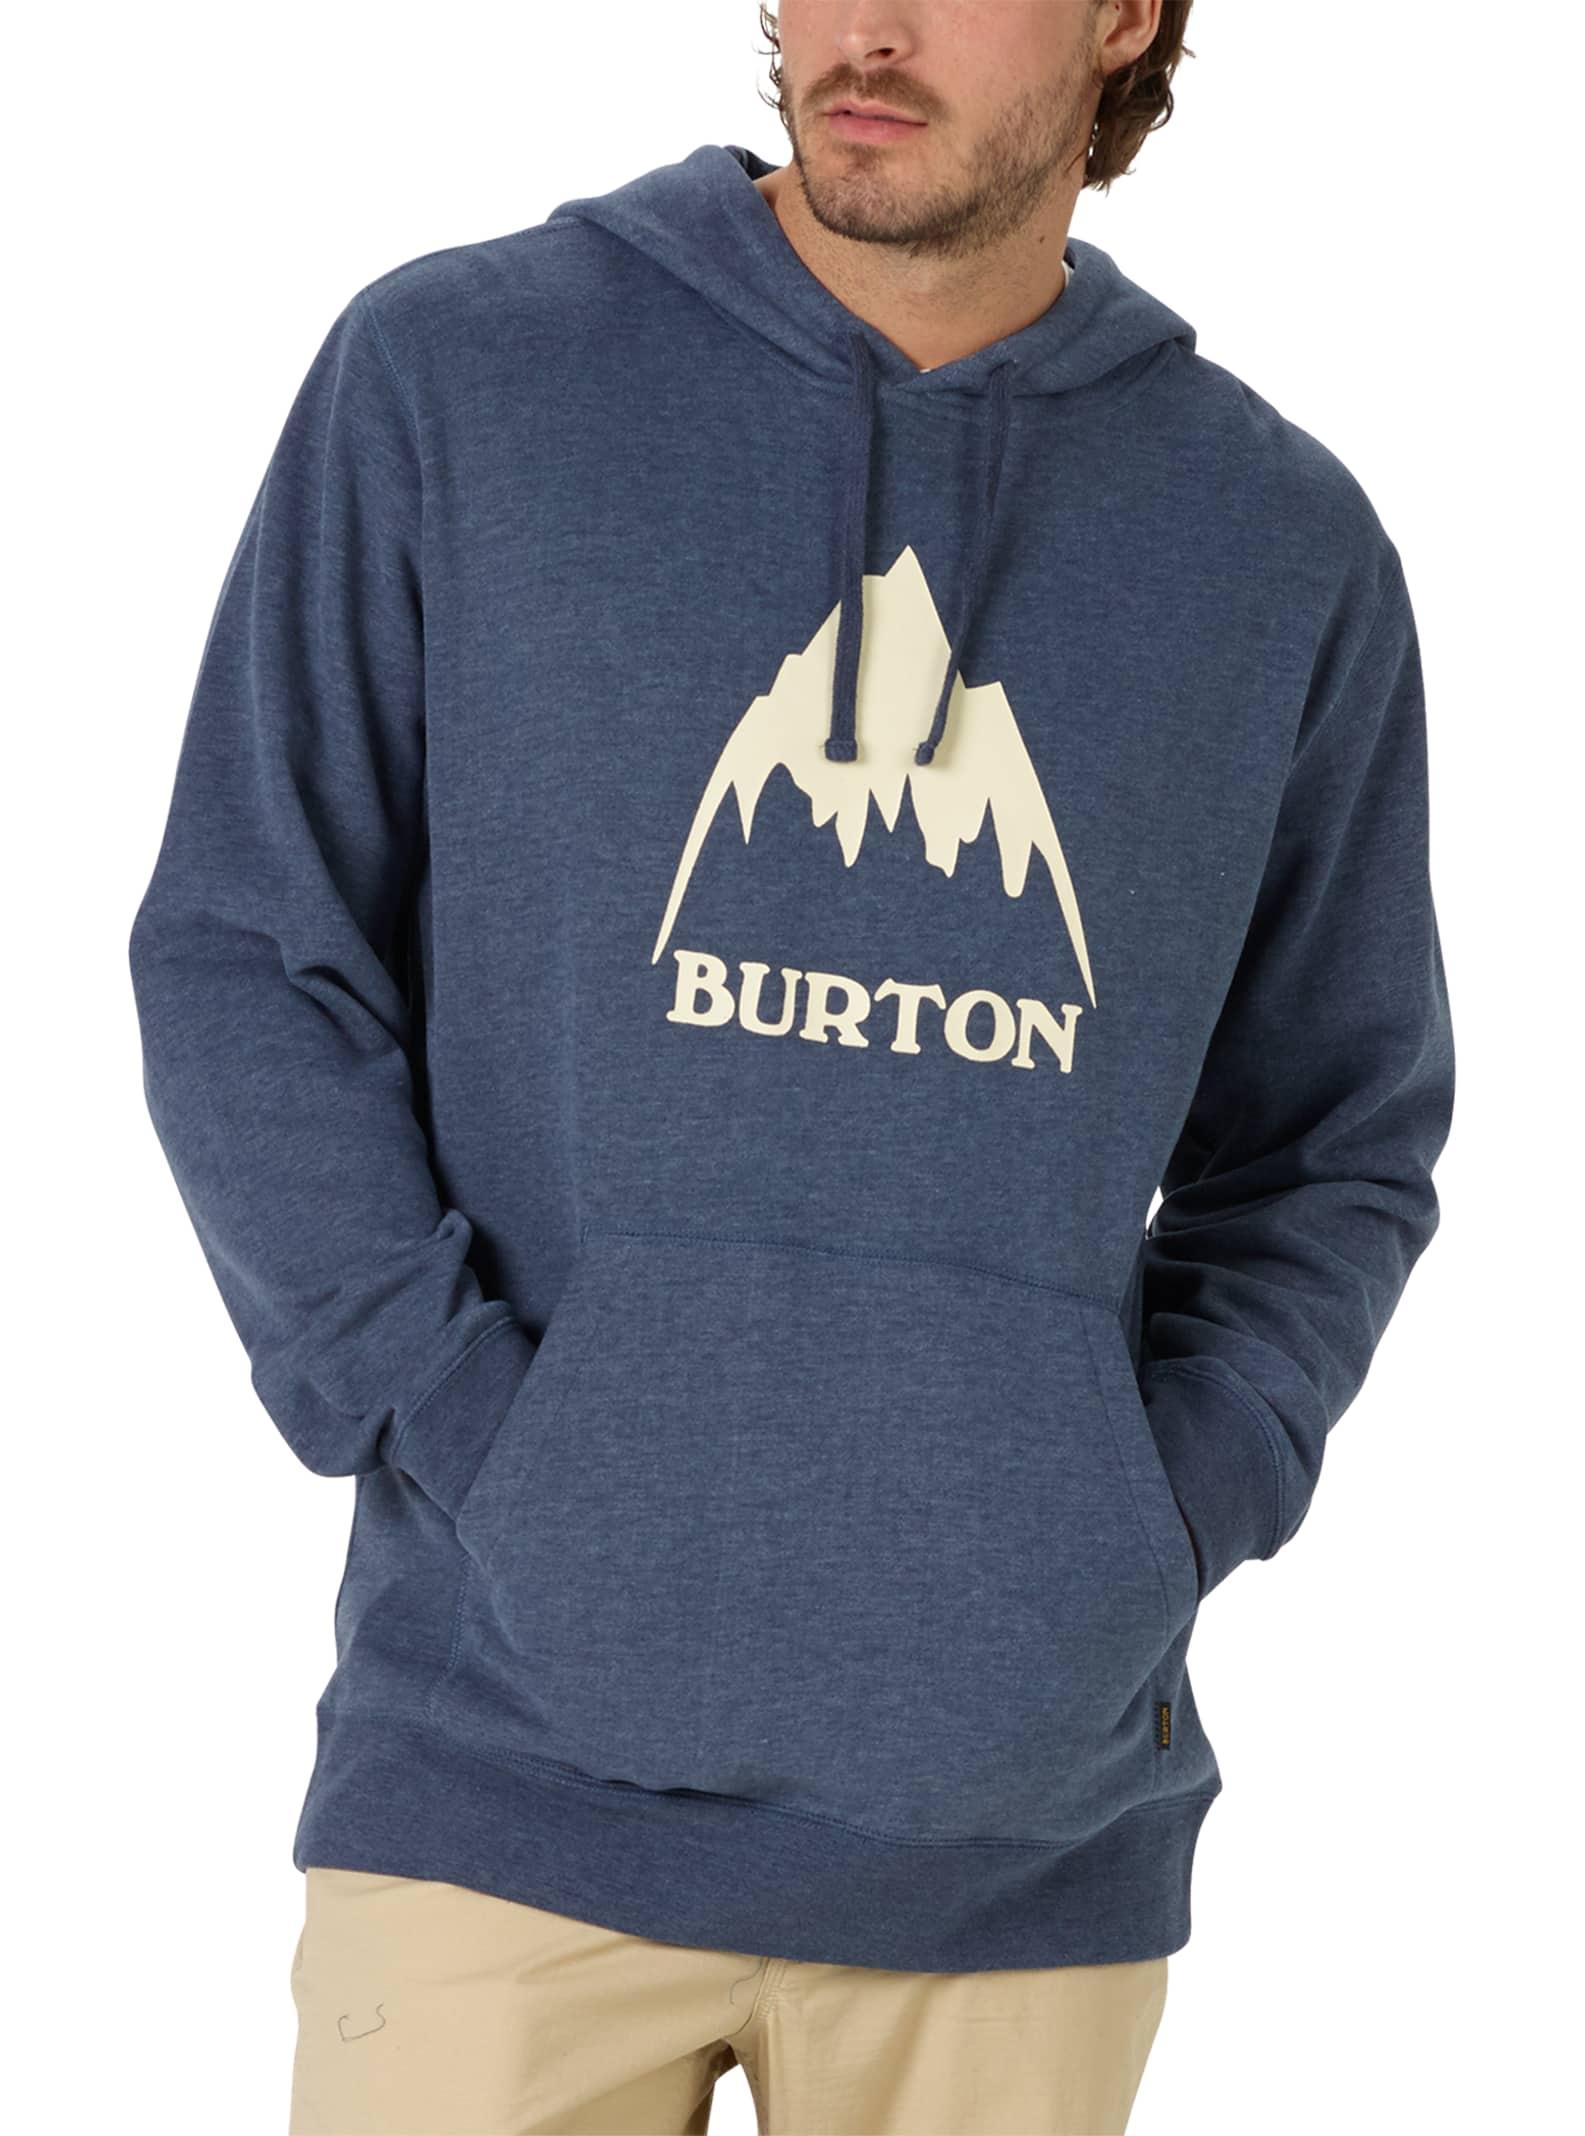 wht to burt off prem hoodies sale burton sleeper up thumbnail seals hoodie hd on